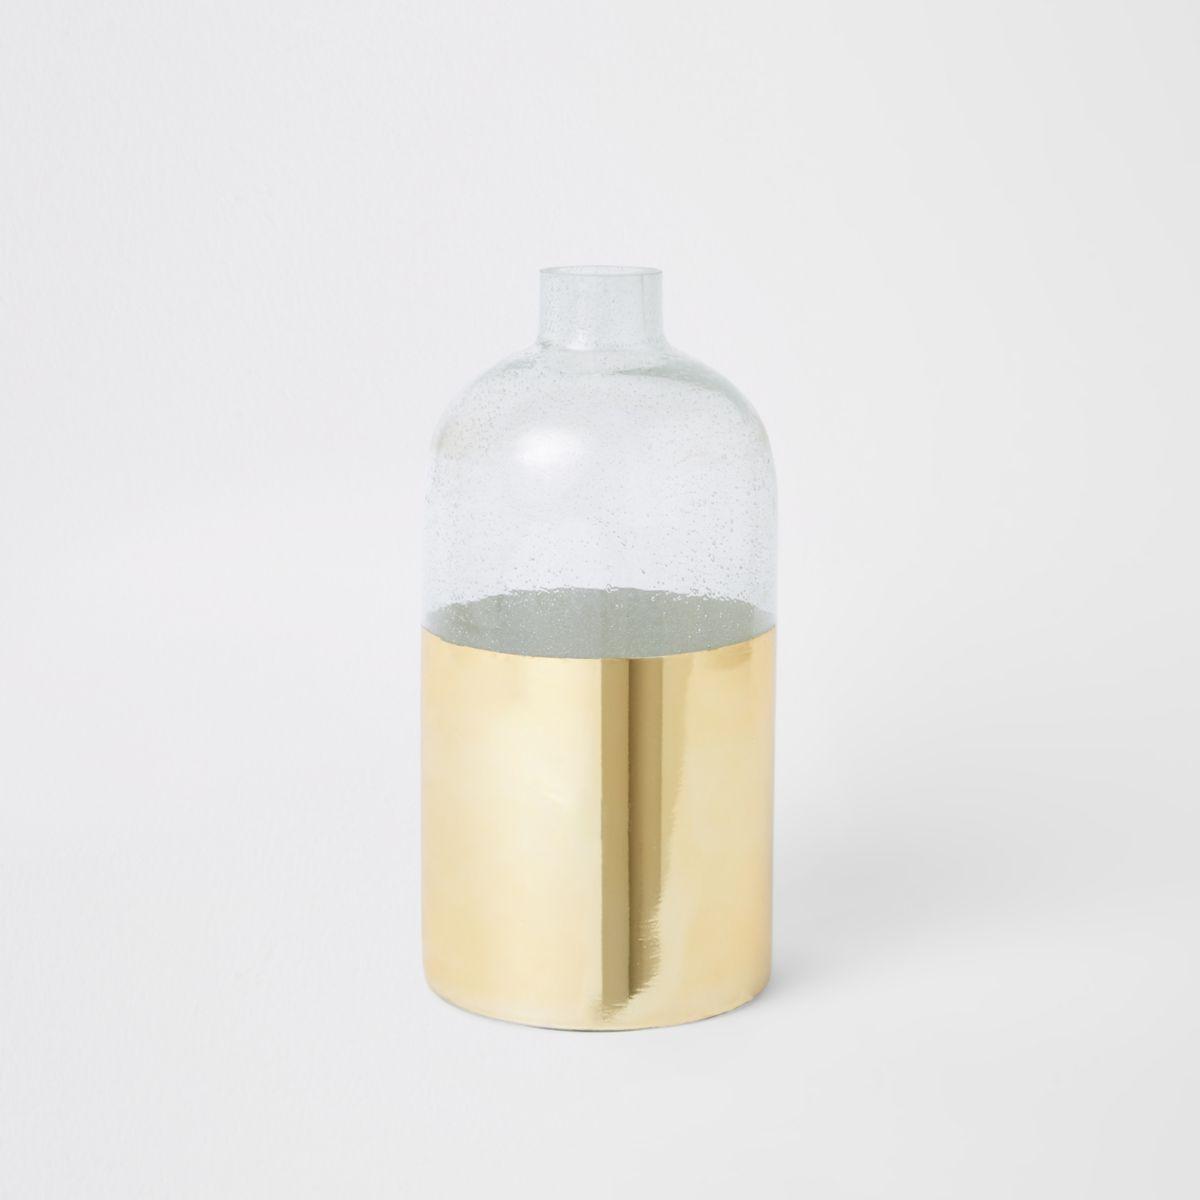 Gold Vase, £25